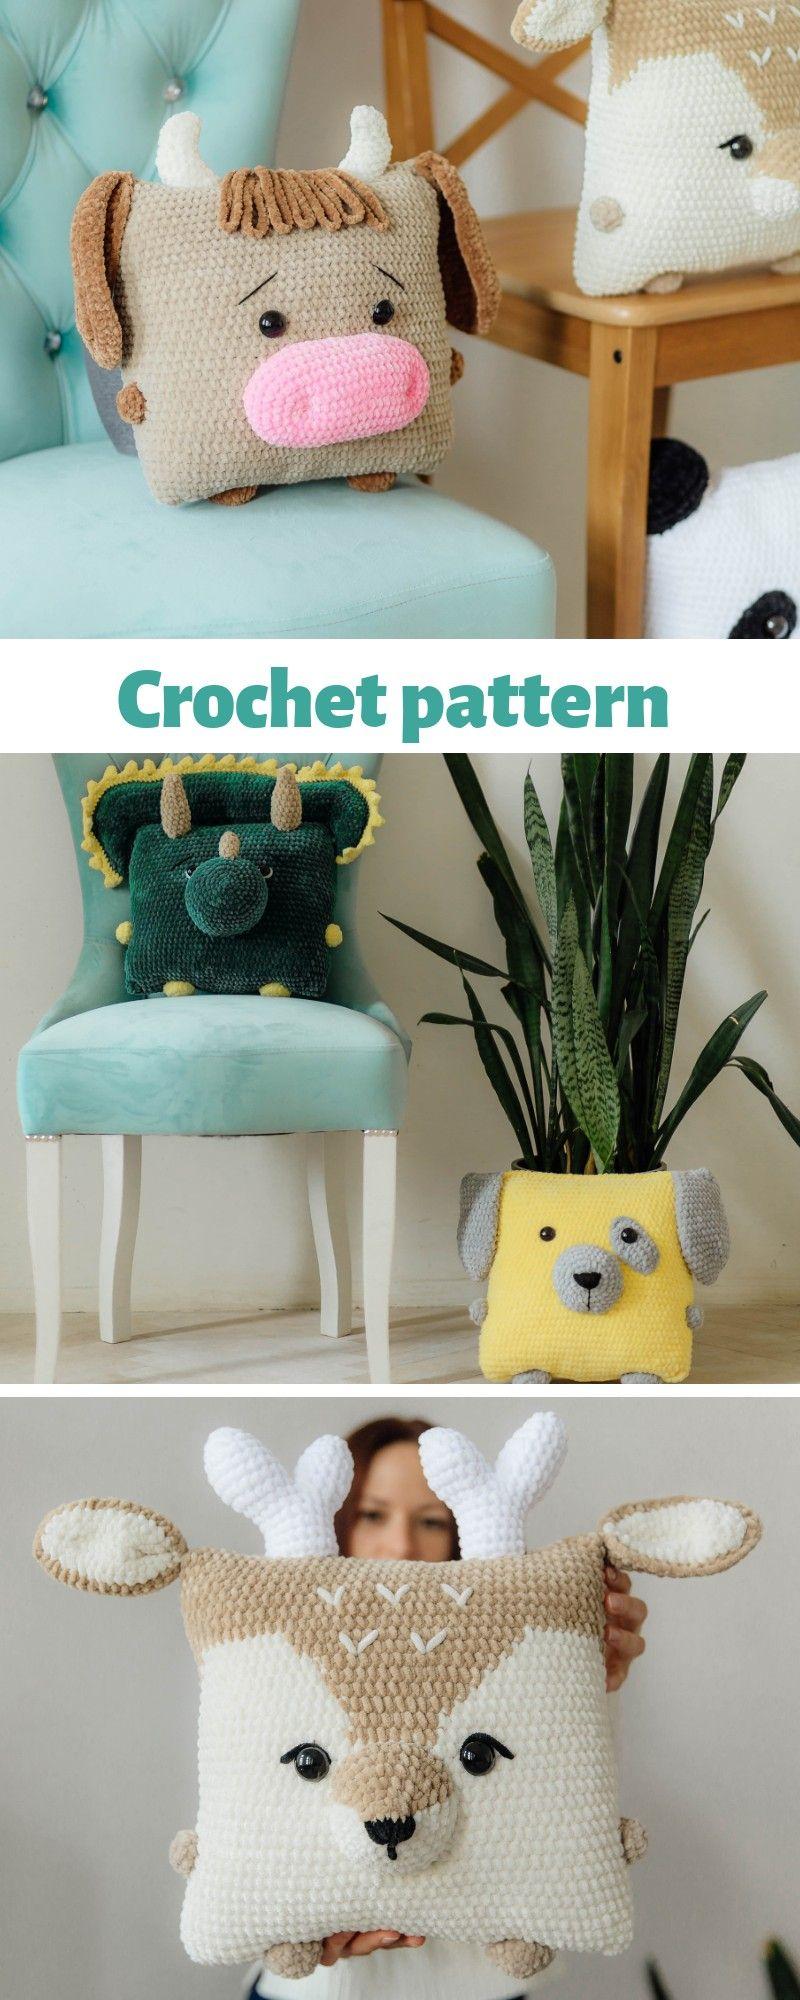 Crochet raindeer, crochet pattern dog, amigurumi dog pattern, crochet pillow, amigurumi dinosaur